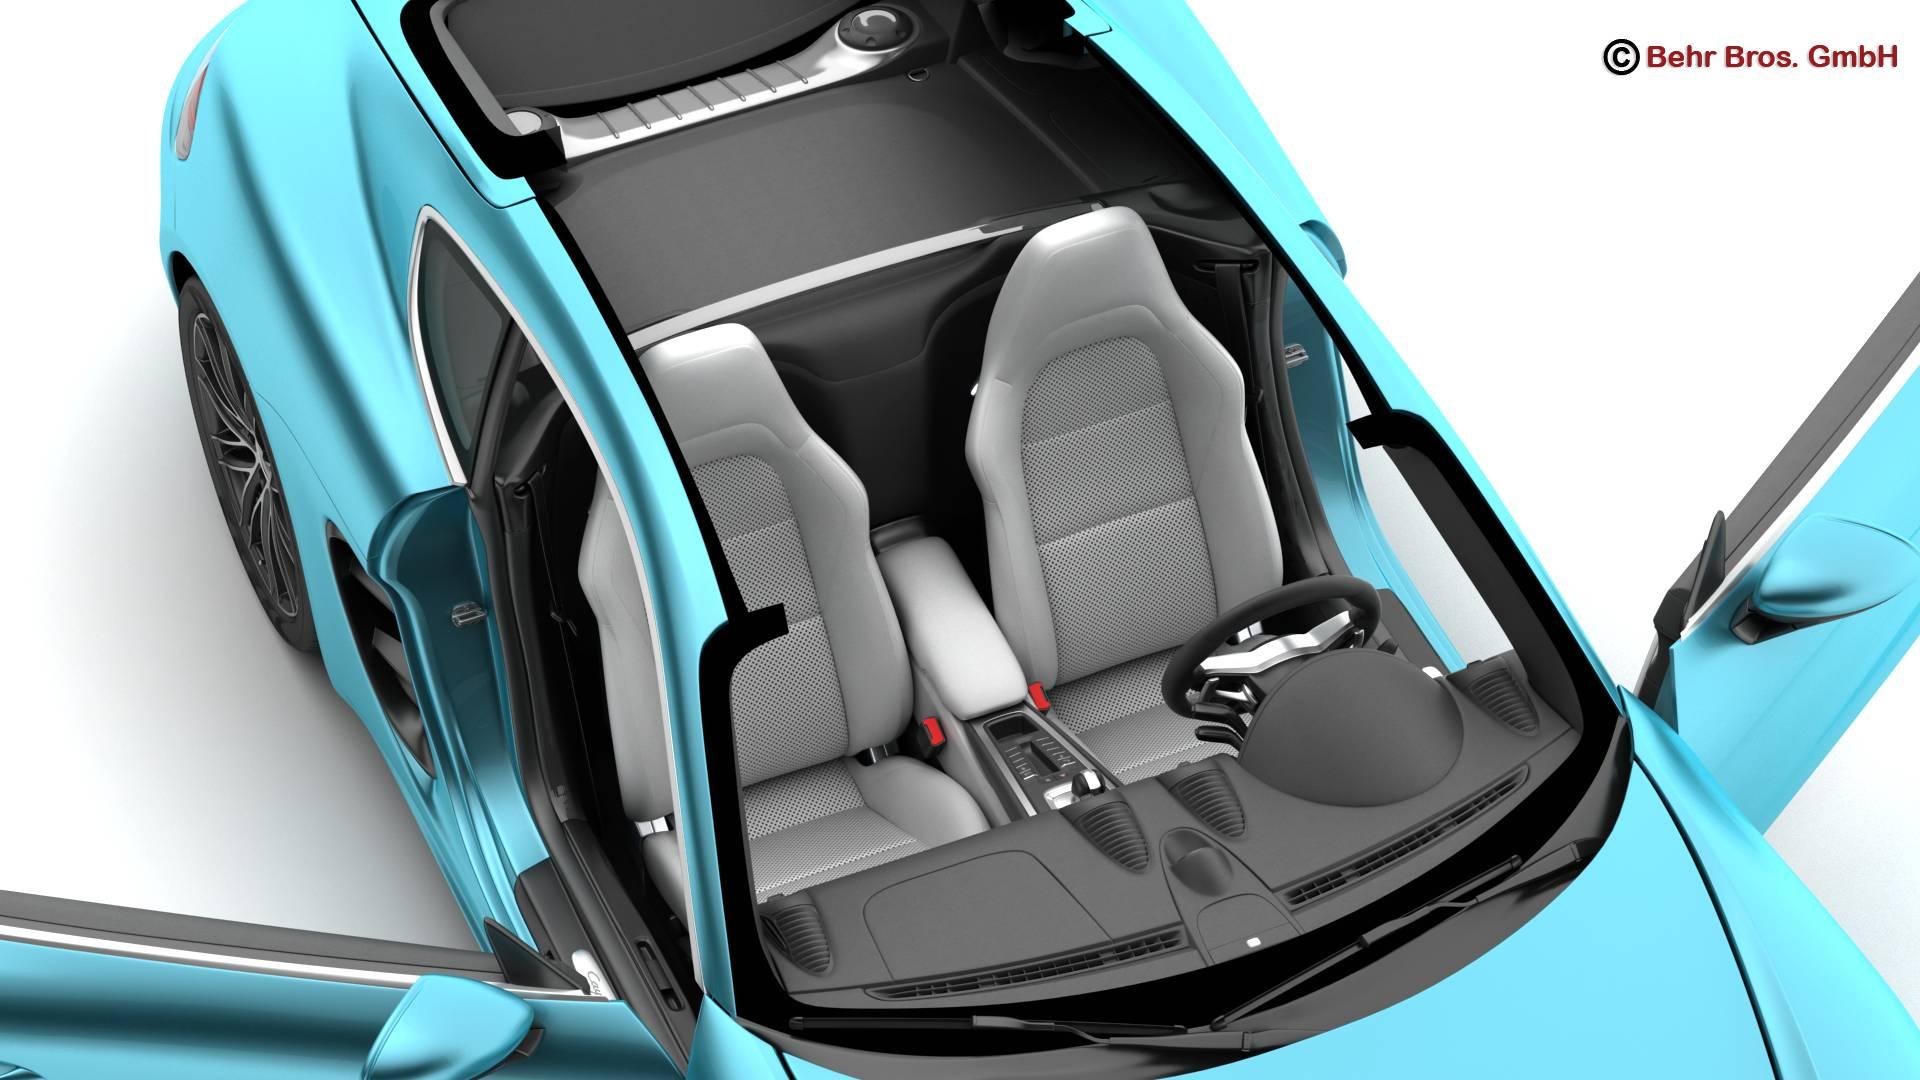 porsche 718 cayman s 2017 3d model 3ds max fbx c4d lwo ma mb obj 220113